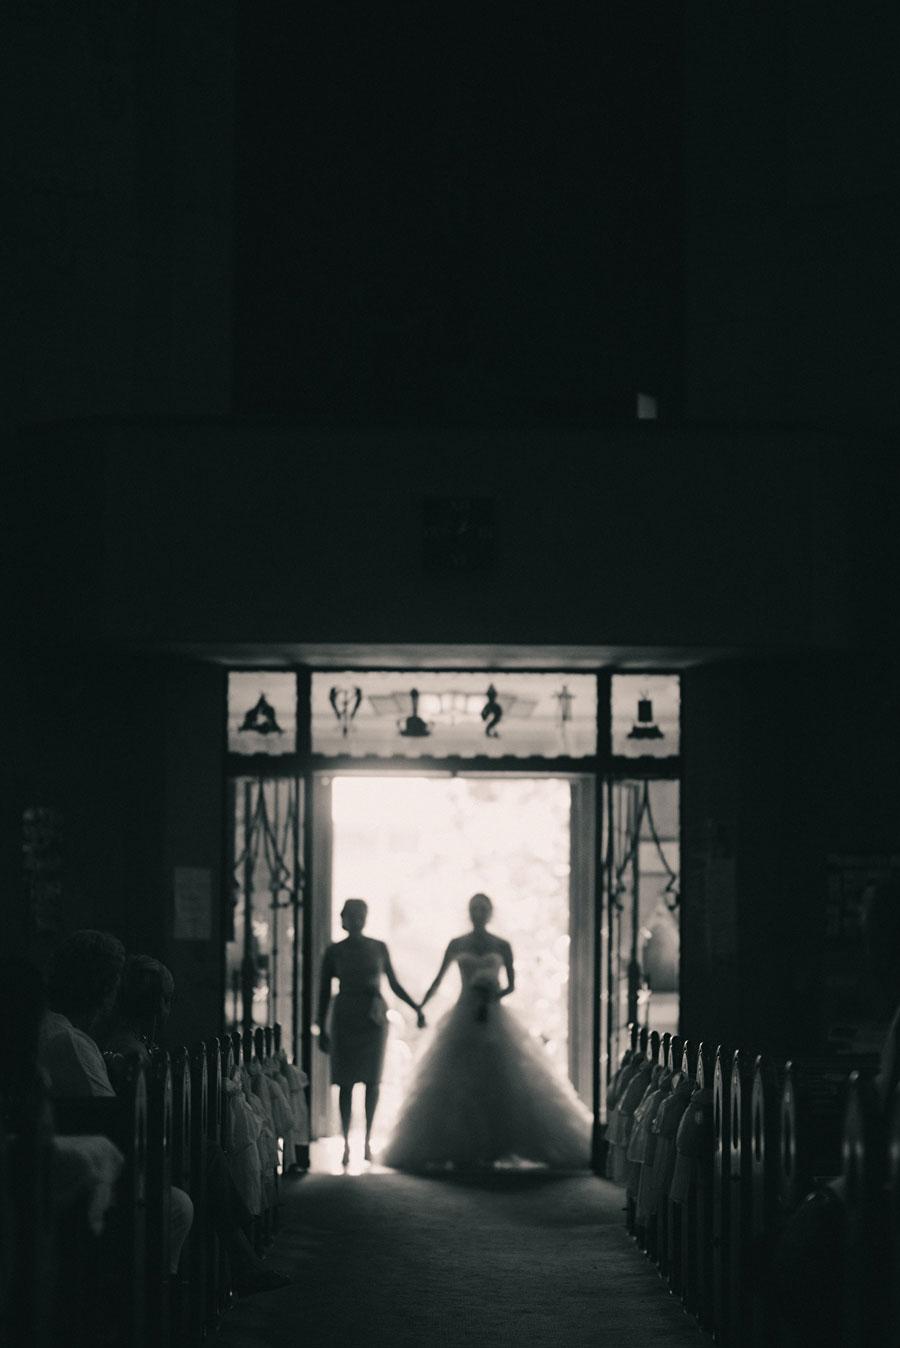 wedding-photography-melbourne-daniel-bilsborough-194.jpg